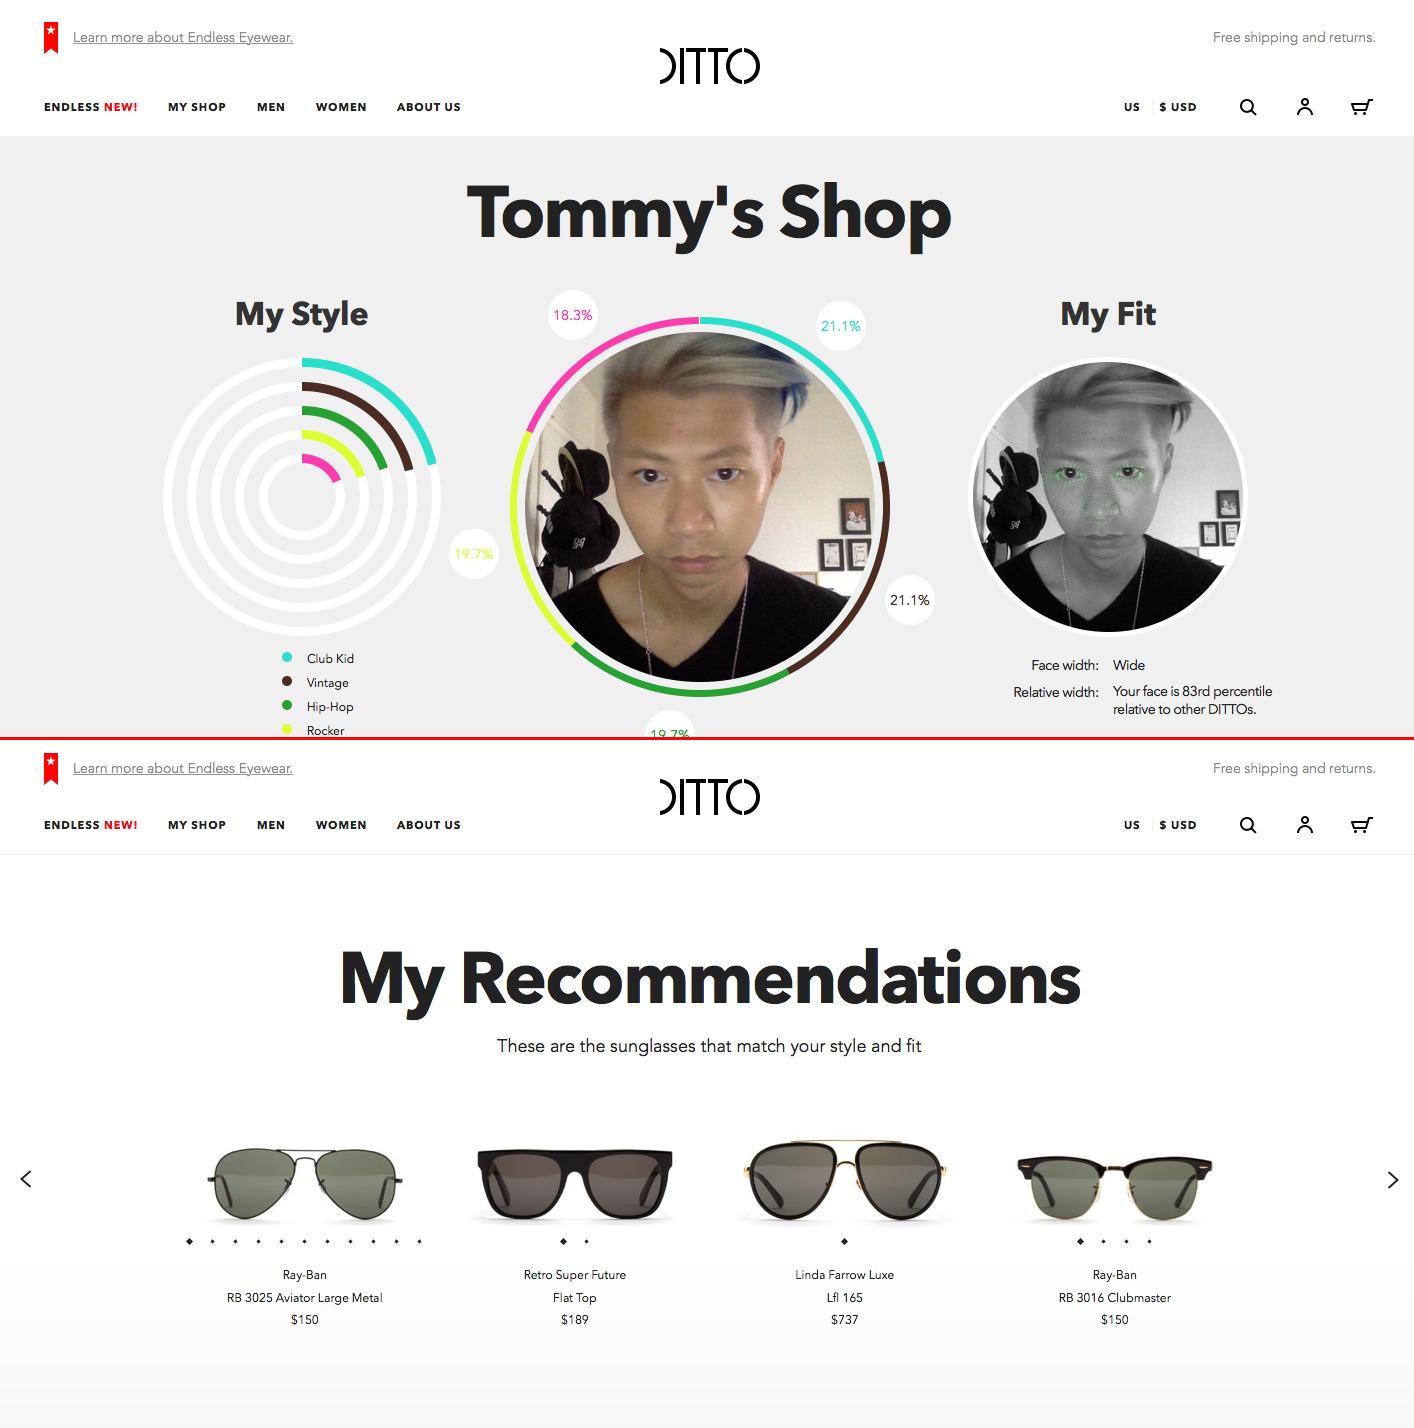 mybelonging-tommylei-ditto-endless-eyewear-service.png